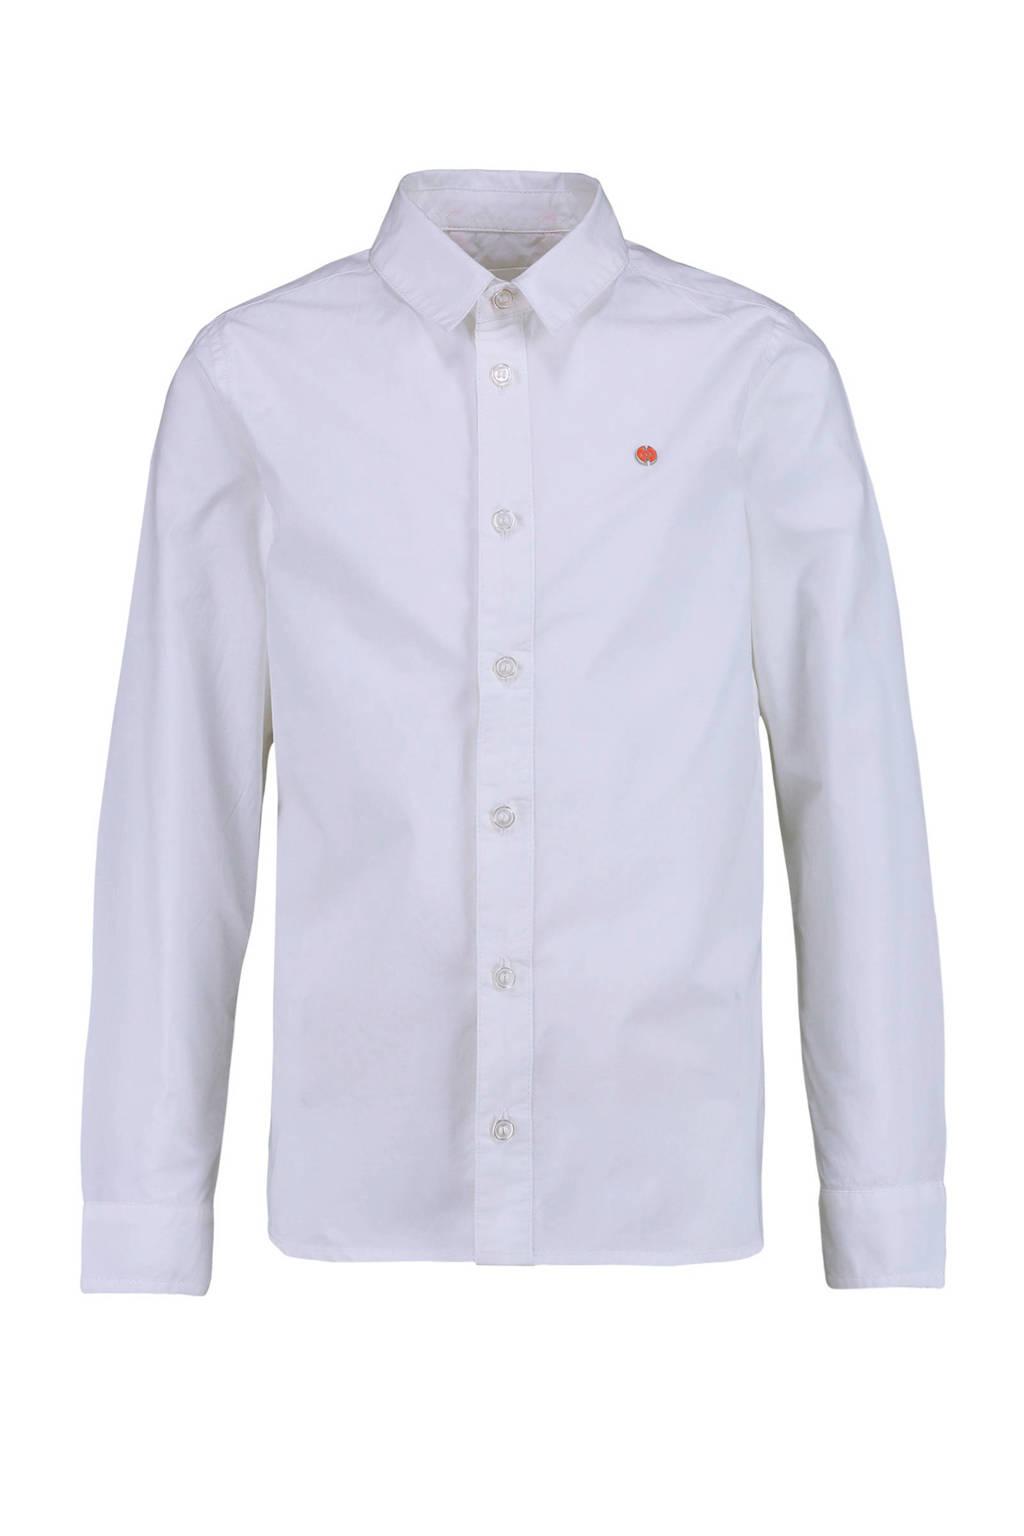 CKS KIDS overhemd Botanuni met 3D applicatie wit/rood, Wit/rood